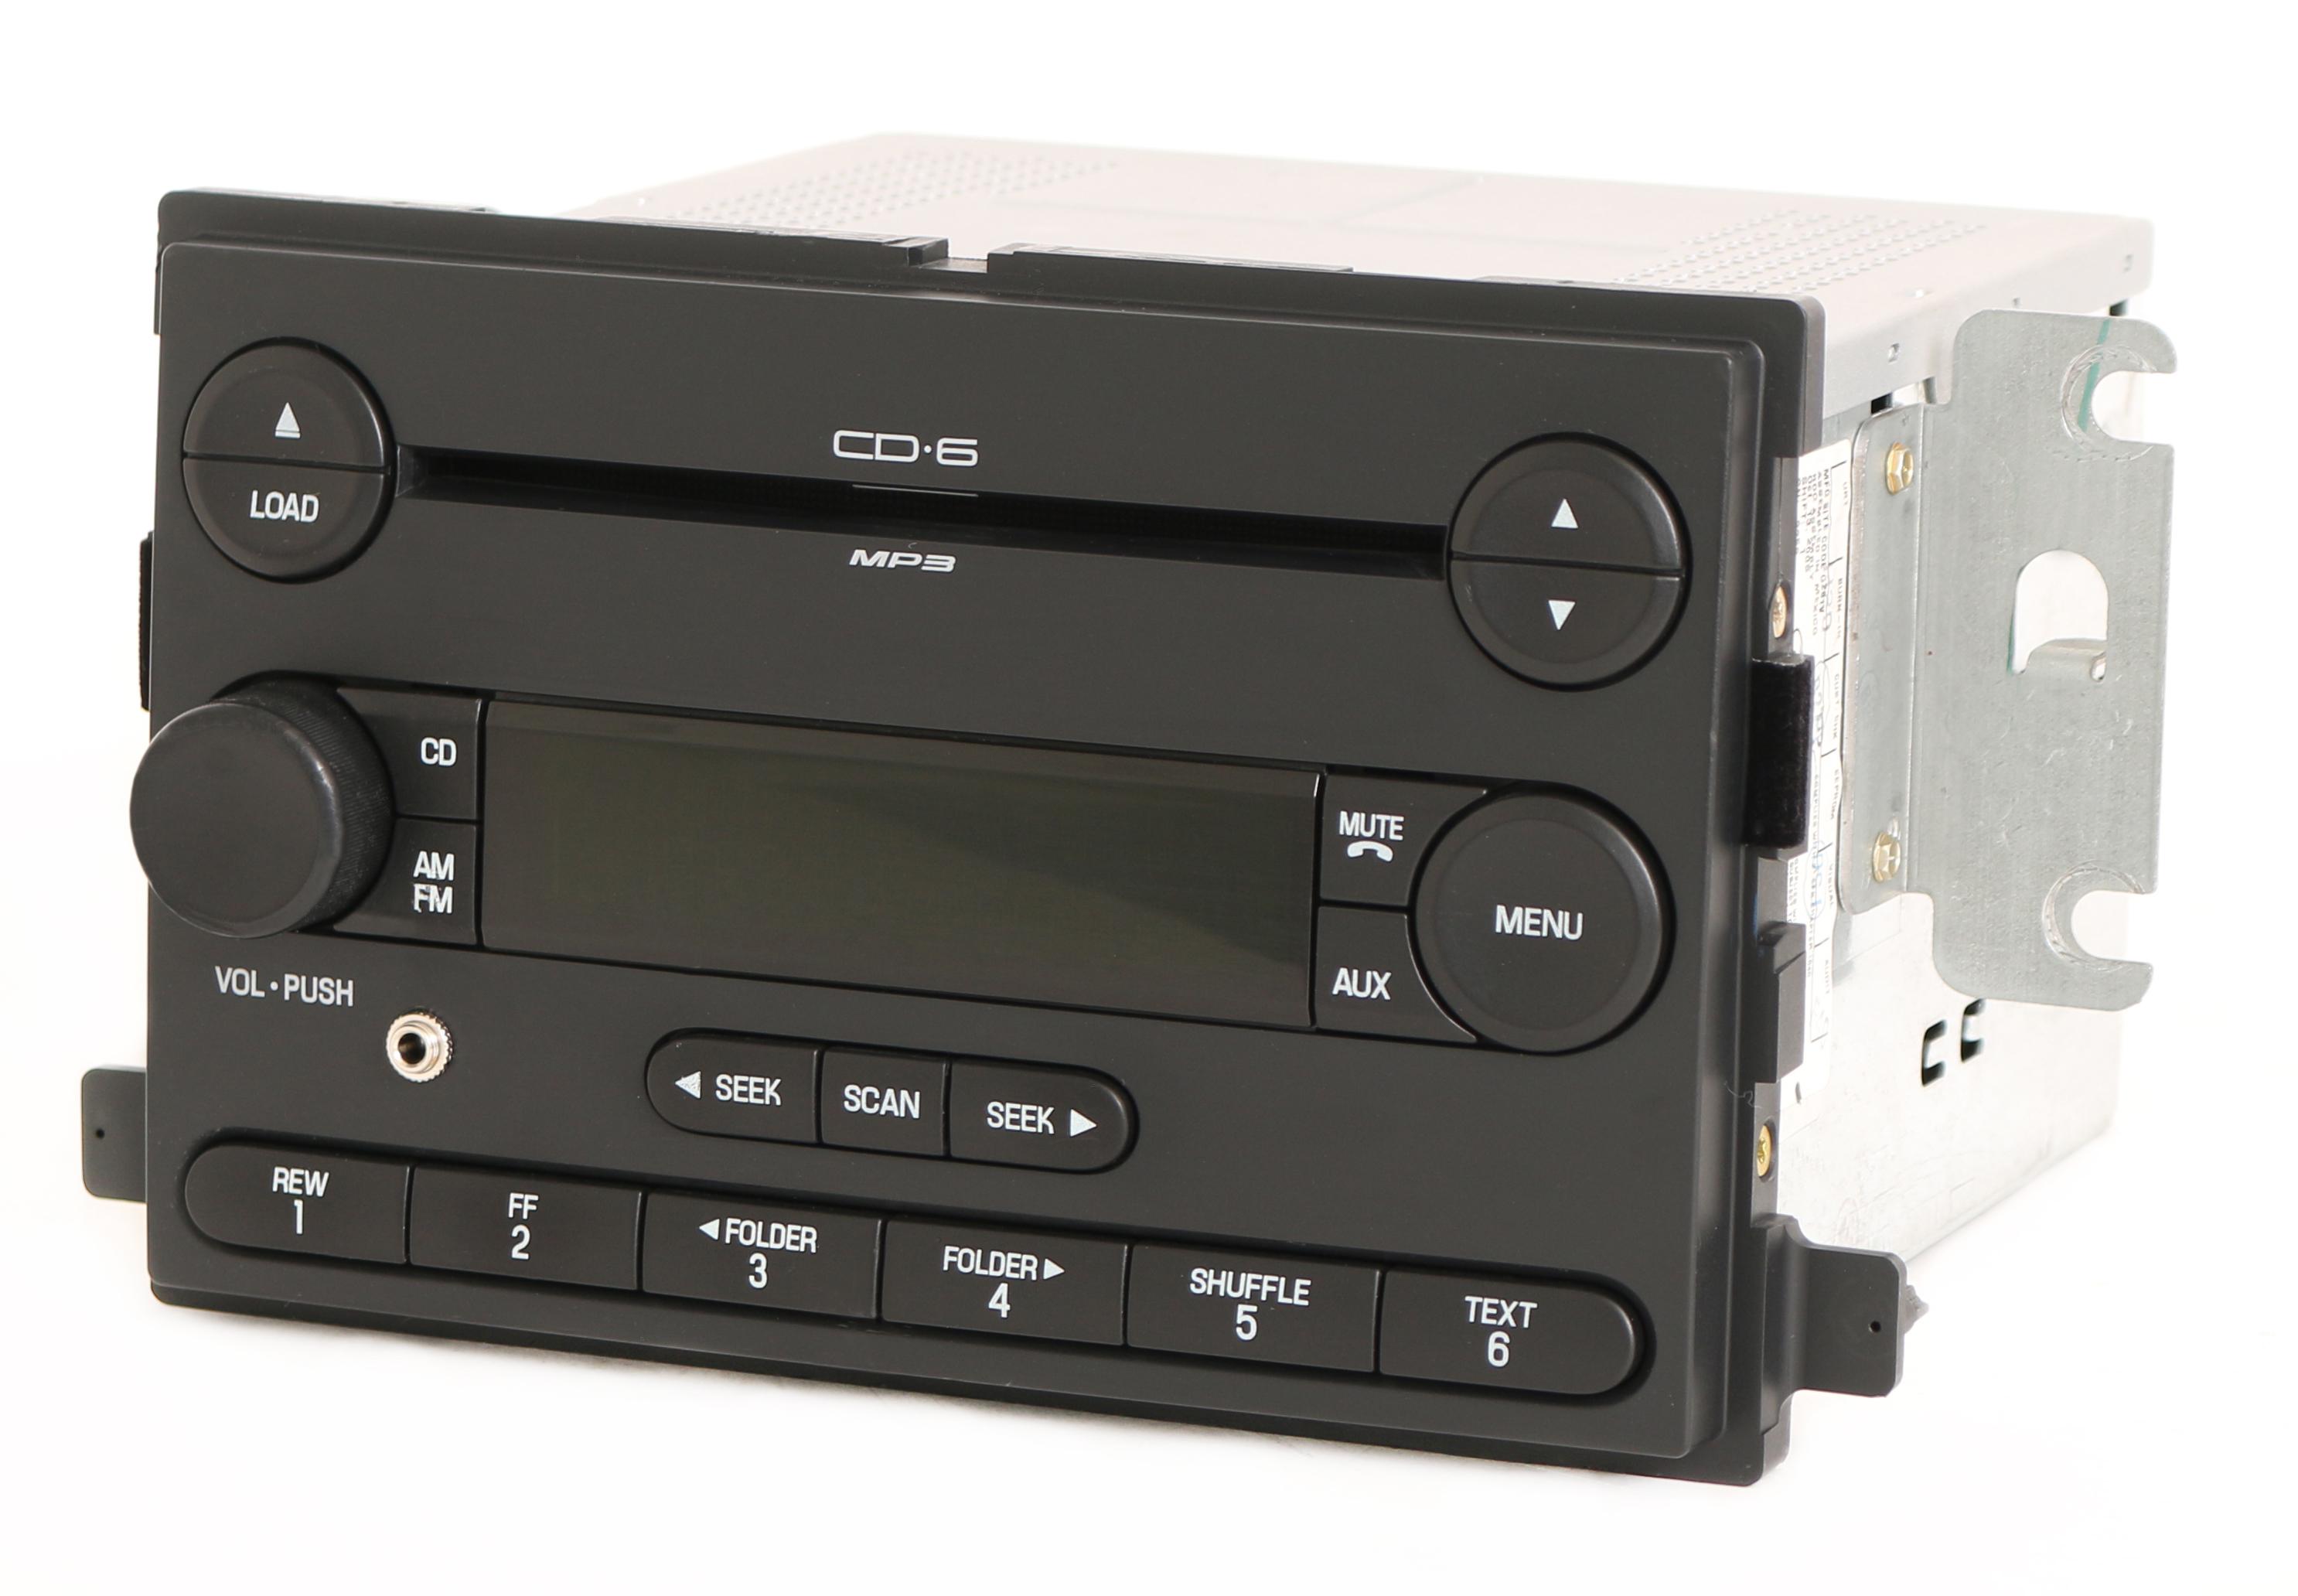 Ford Focus 2006-2007 Radio AM FM 6 Disc CD Player w Aux Input PN  6S4T-18C815-AD - 1 Factory Radio